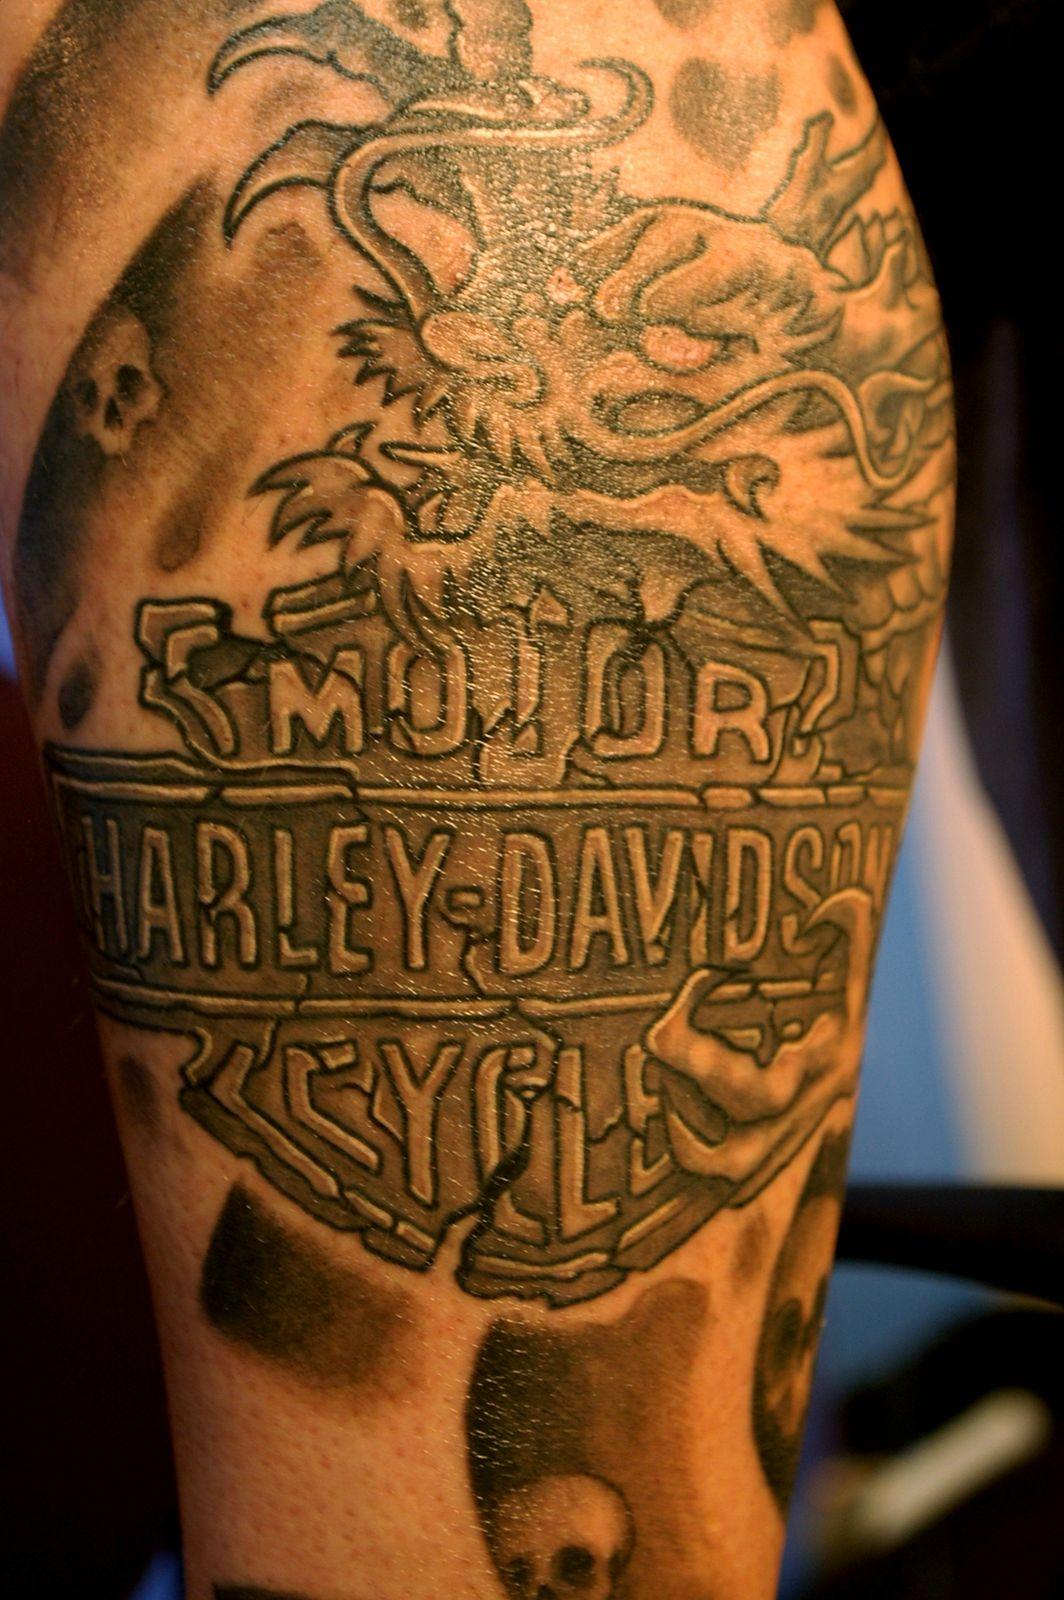 Harley Davidson Eagle Tattoo Free Hd Wallpaper